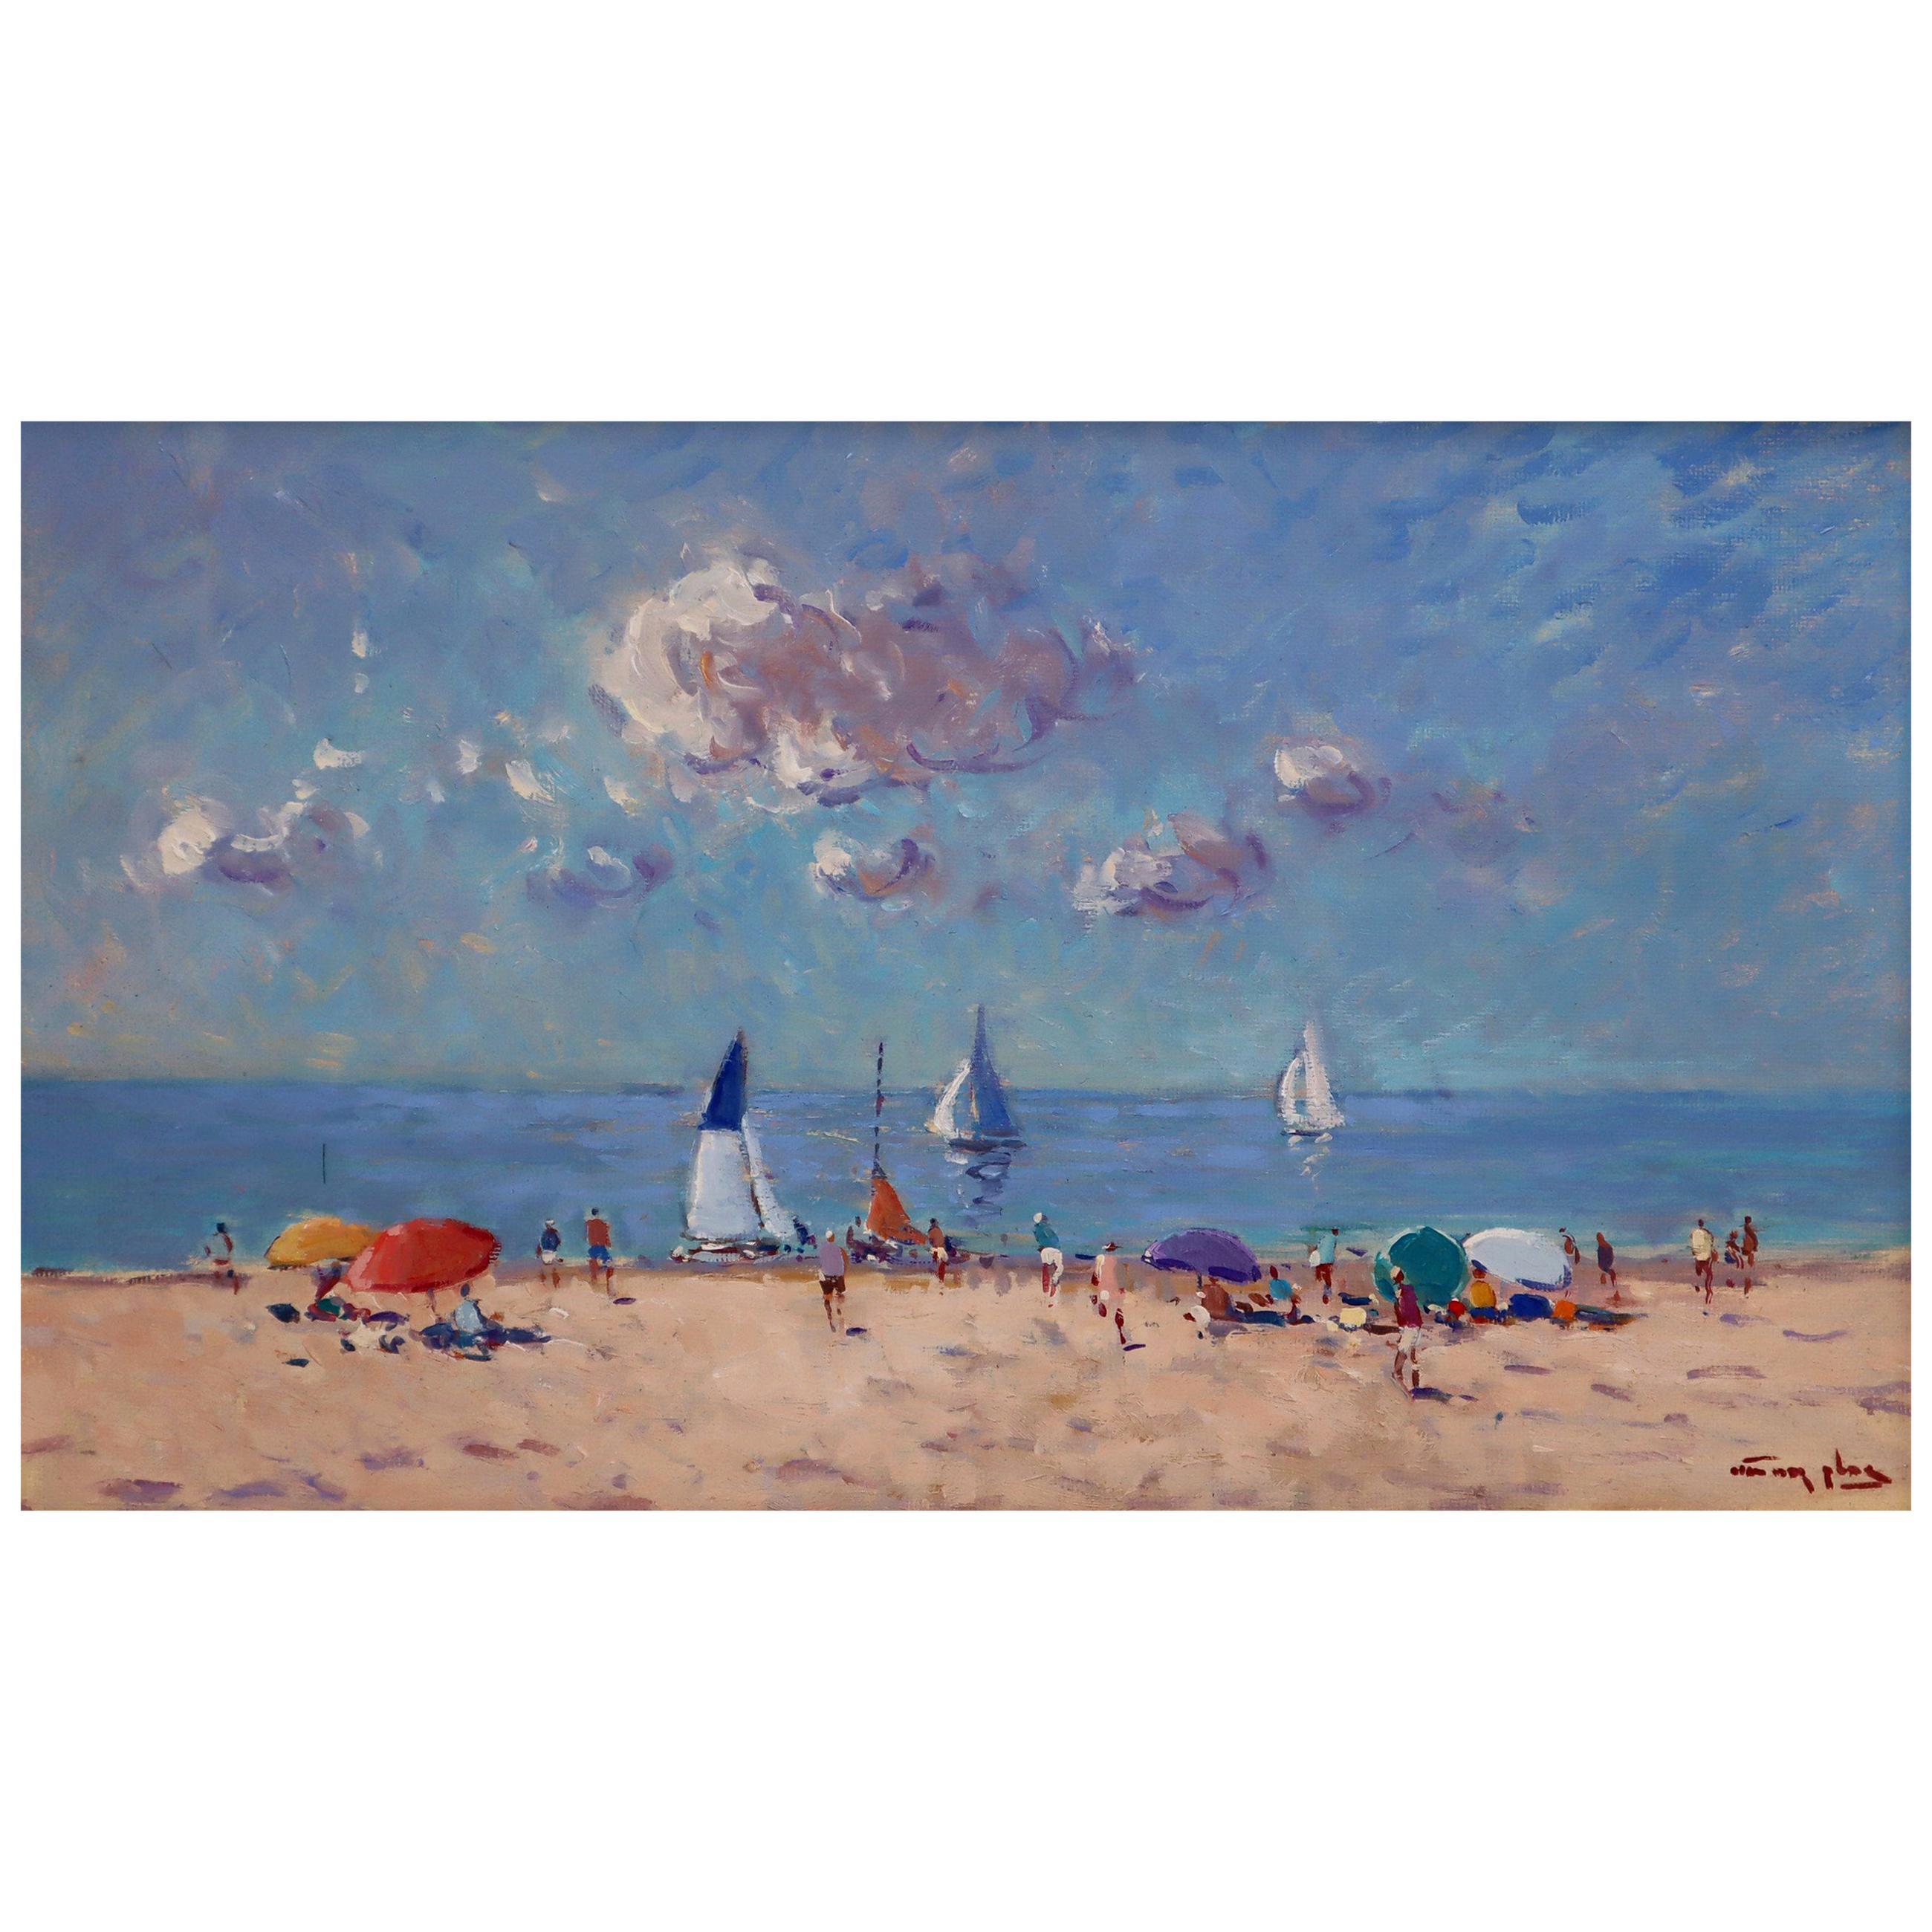 Niek Van Der Plas, Oil on Canvas, Summer Beach